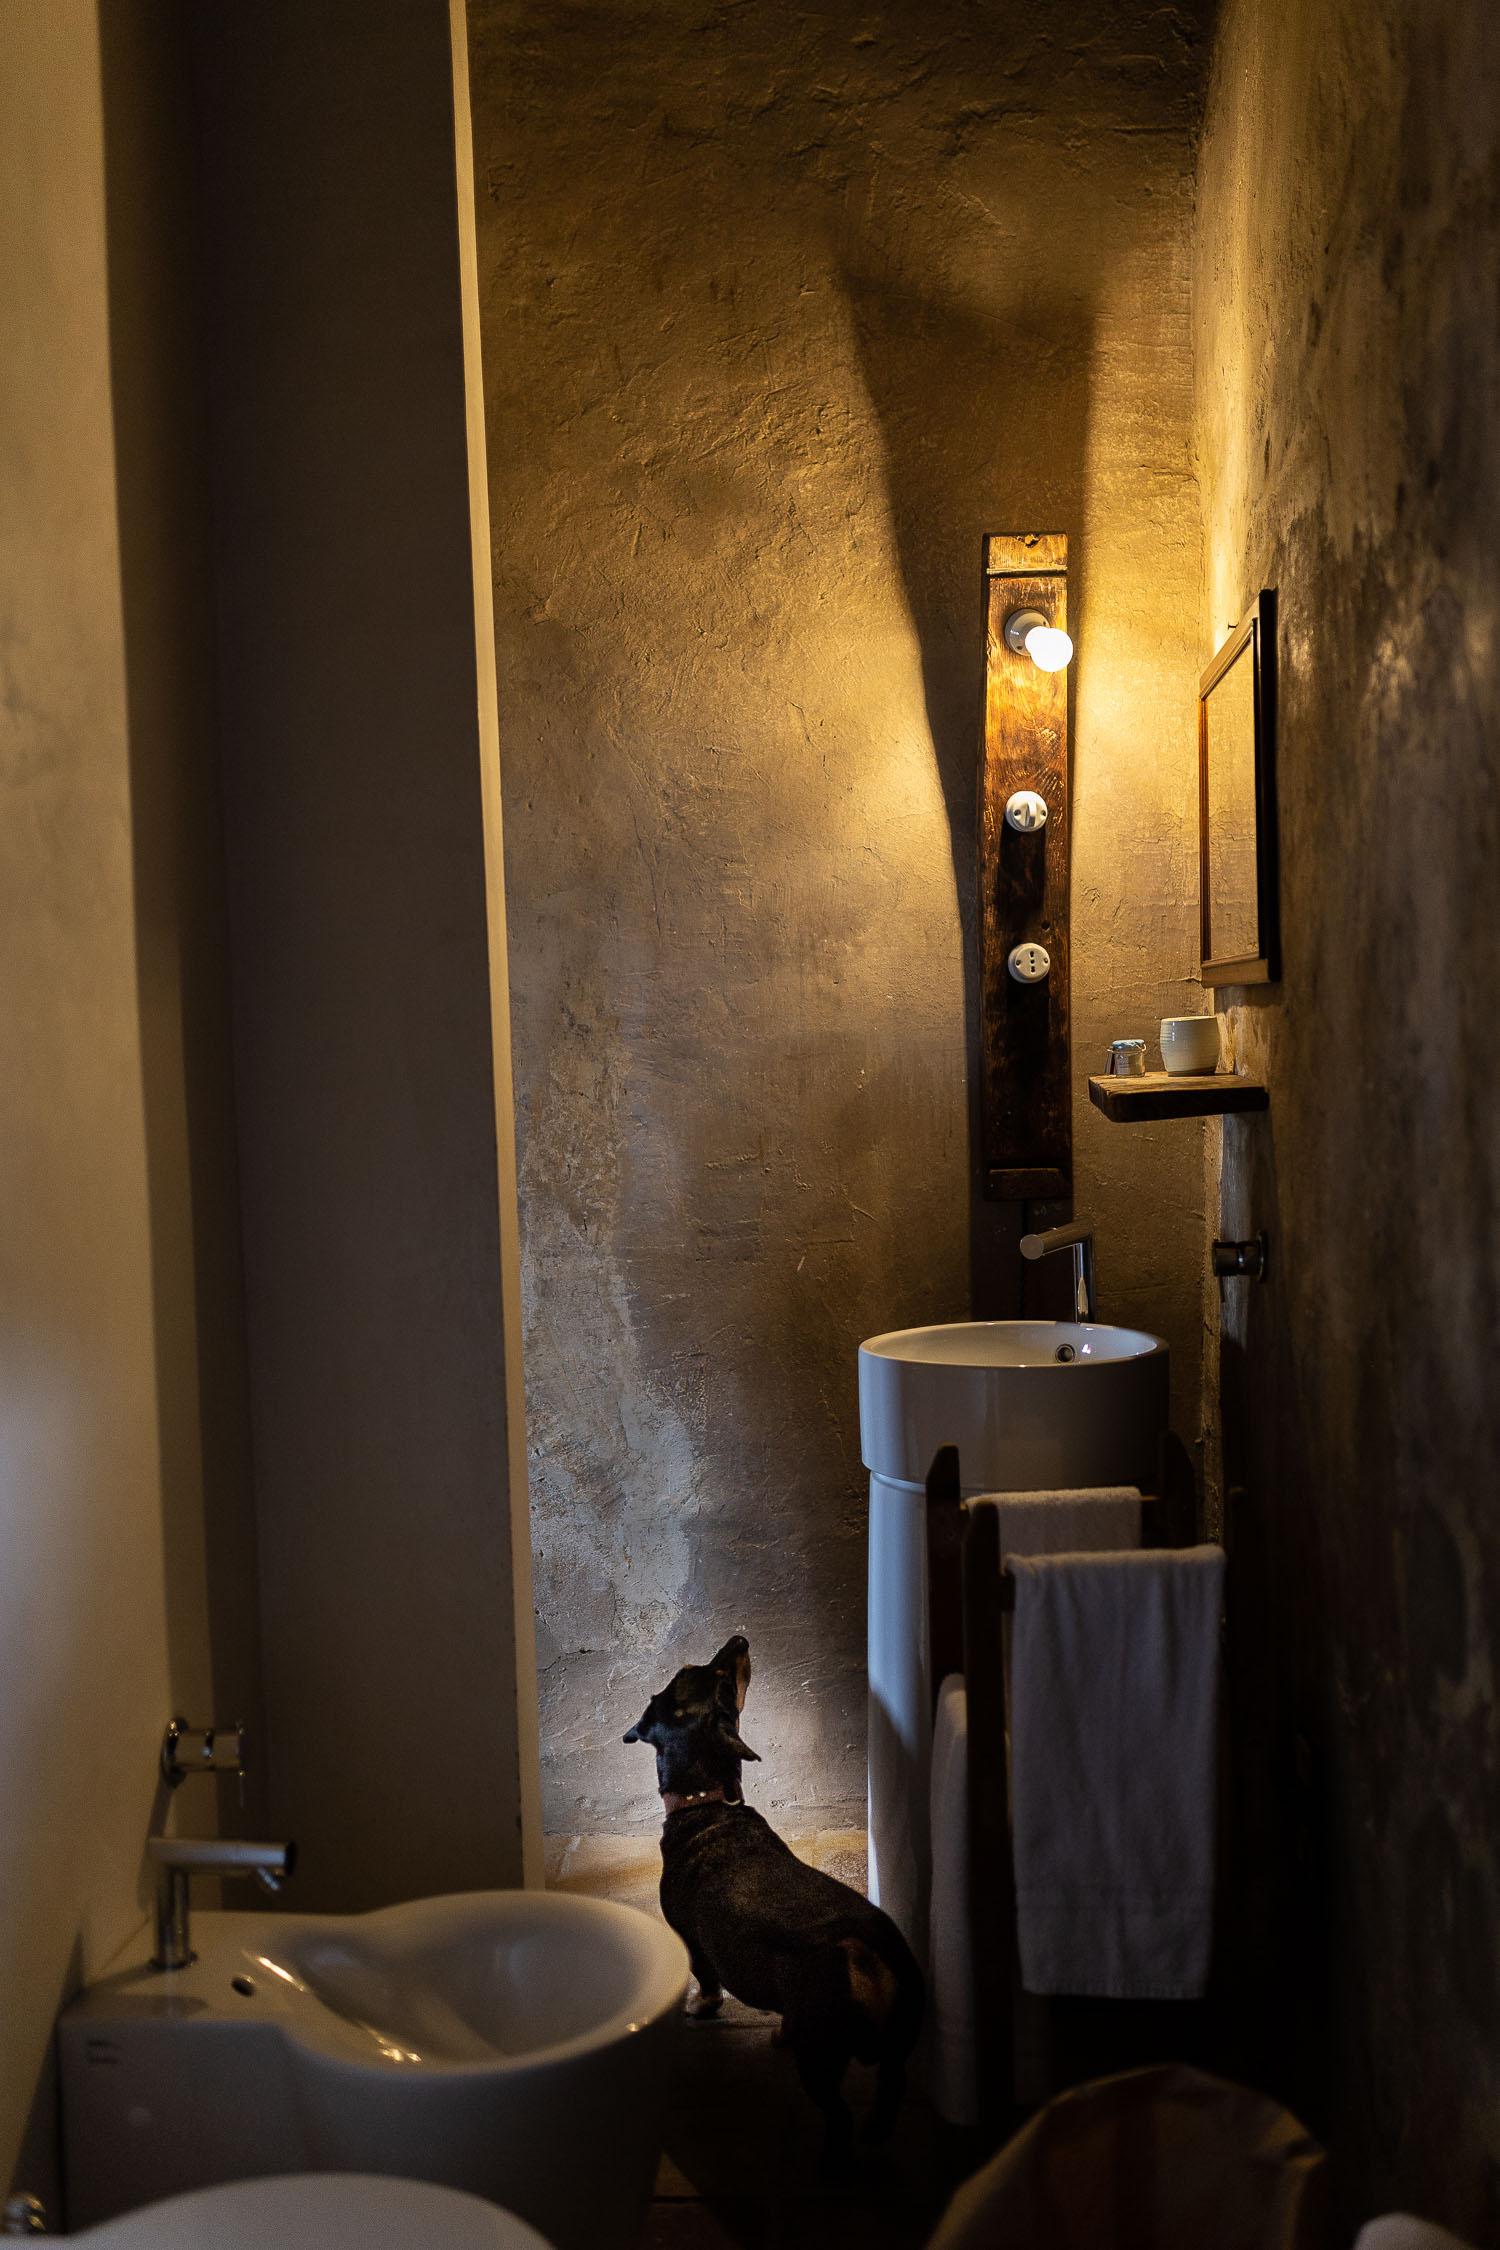 Sextantio-Albergo-Diffuso-Bathroom-Abruzzo-5551.jpg